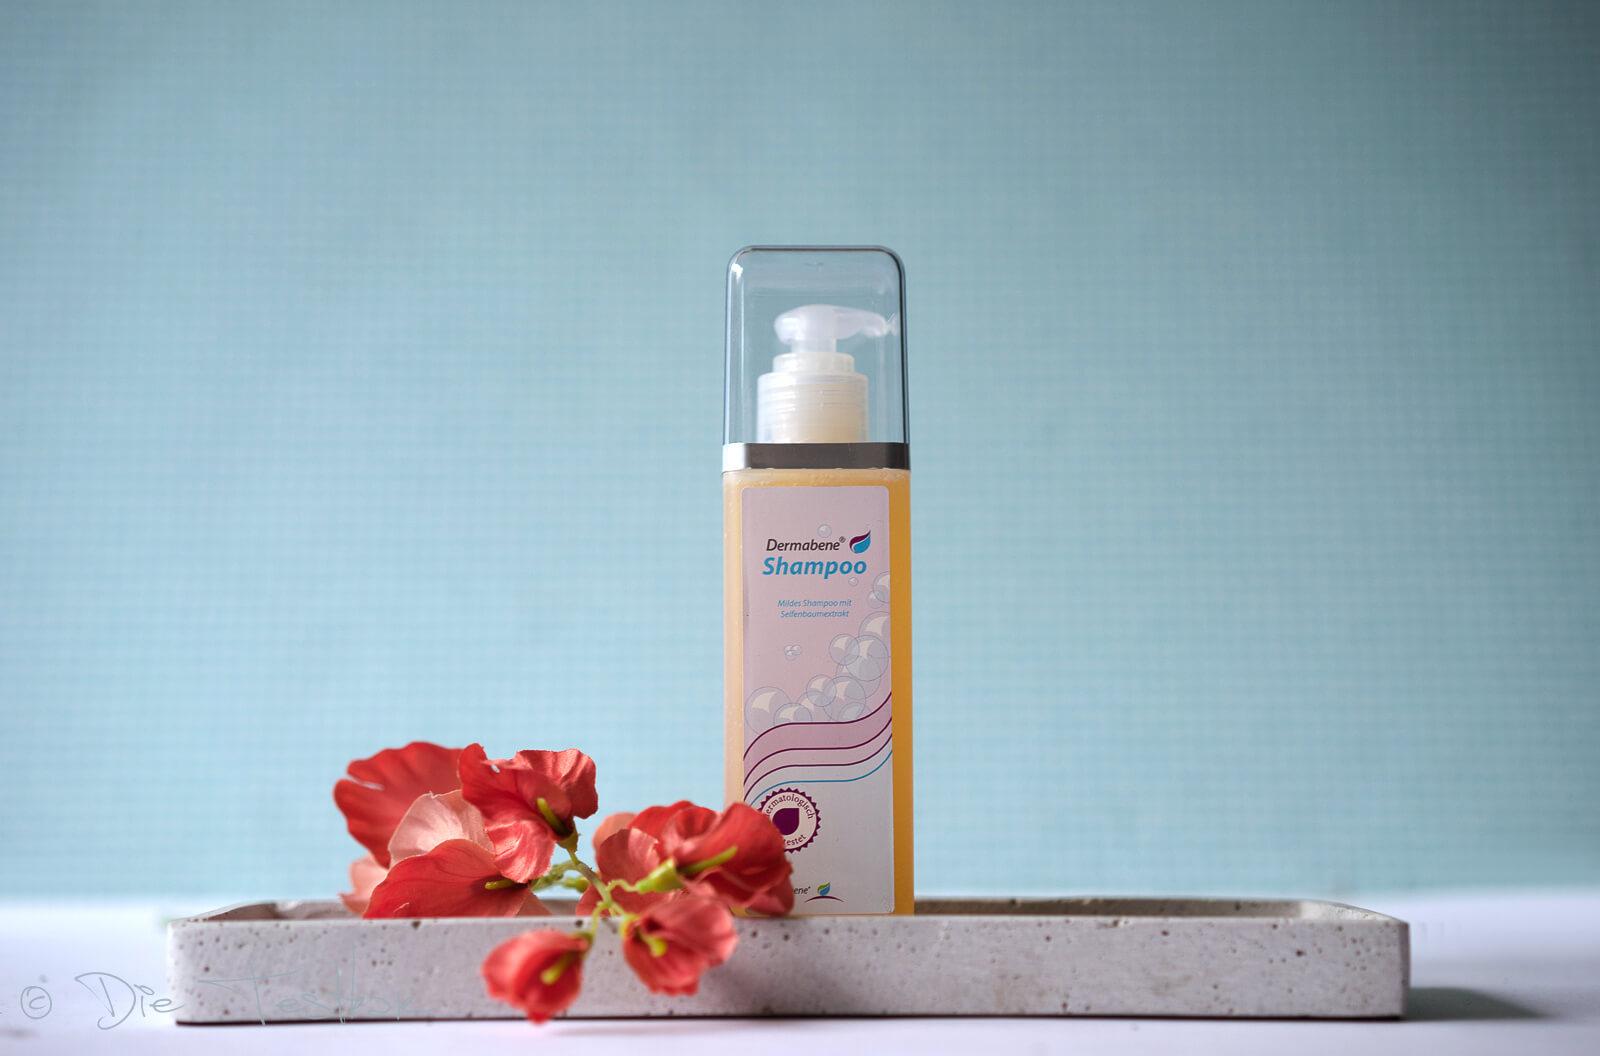 Dermabene® Shampoo